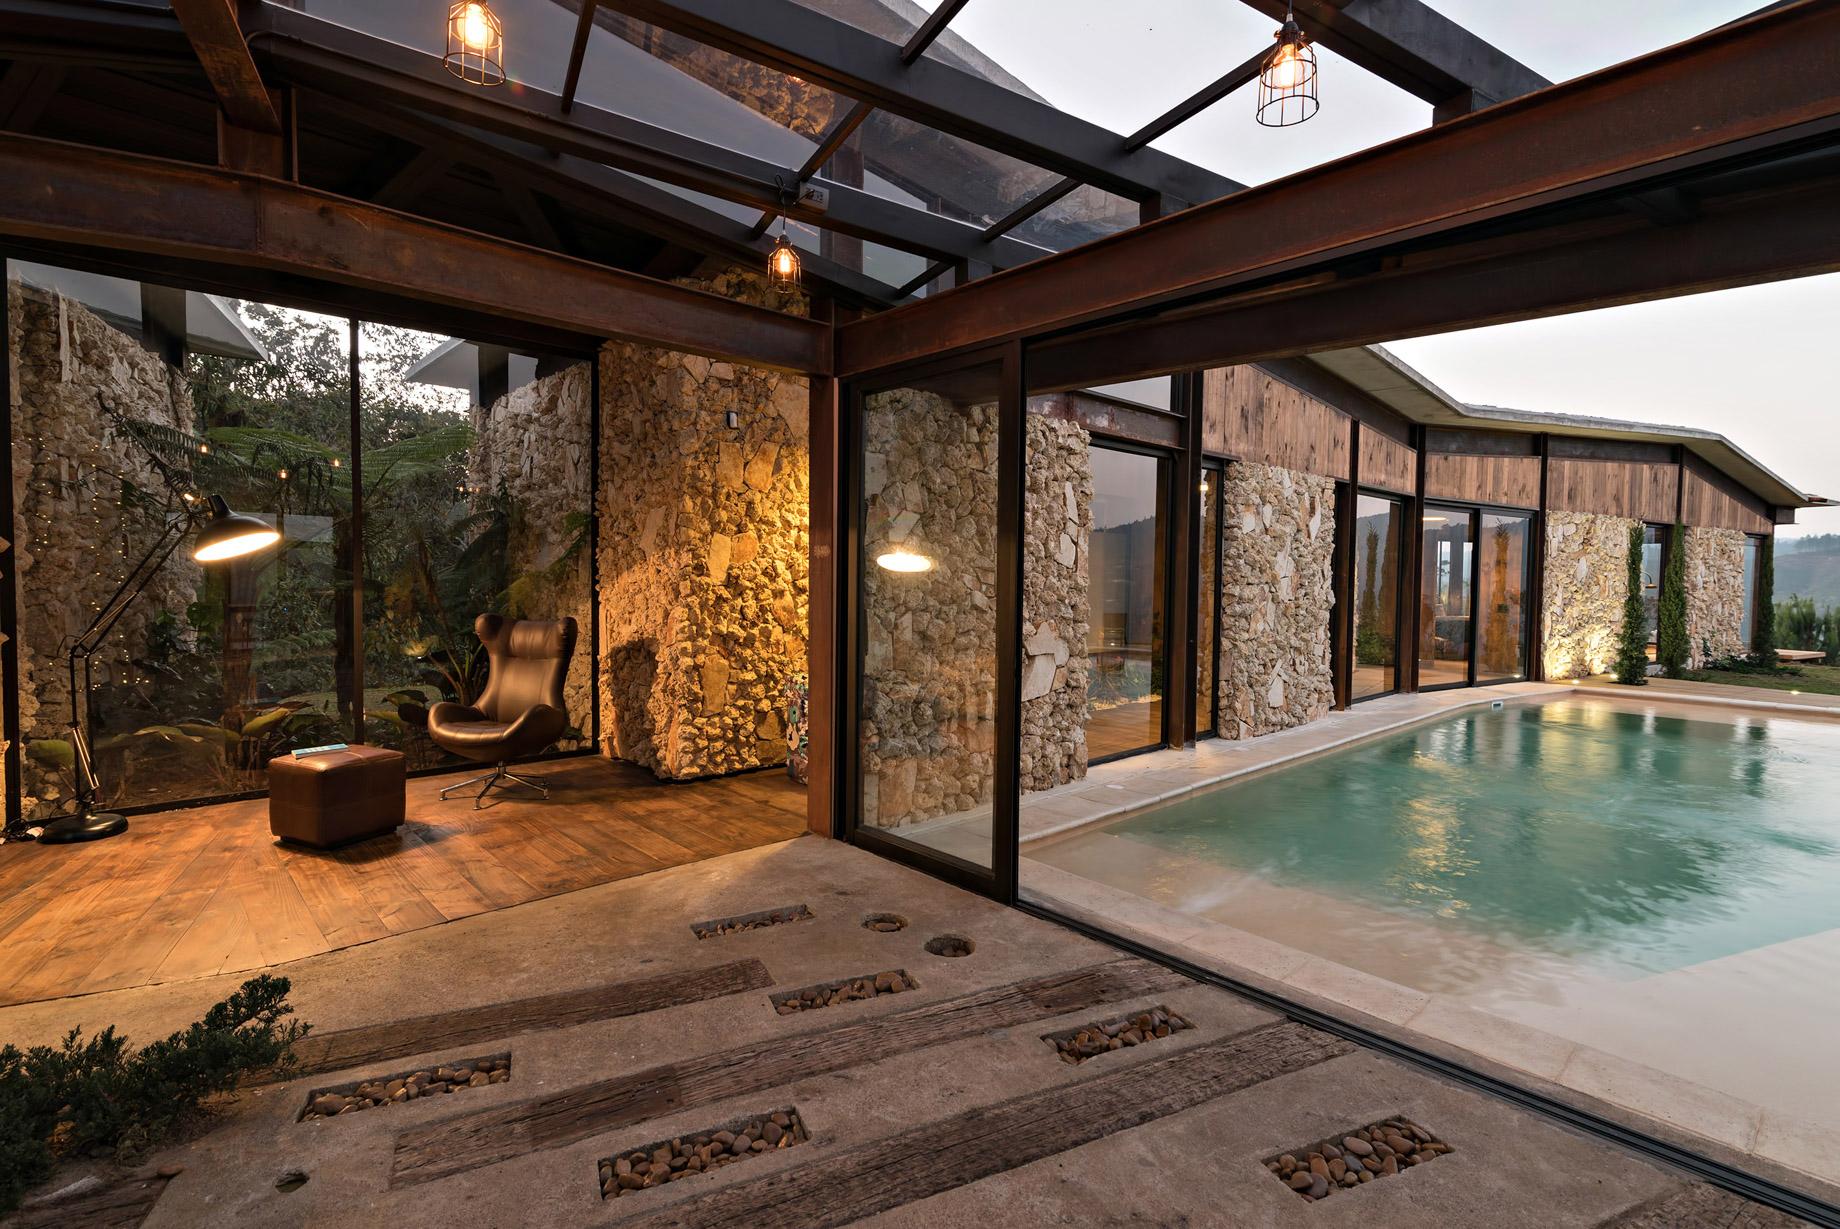 Gozu House Luxury Residence – El Retiro, Antioquia, Colombia